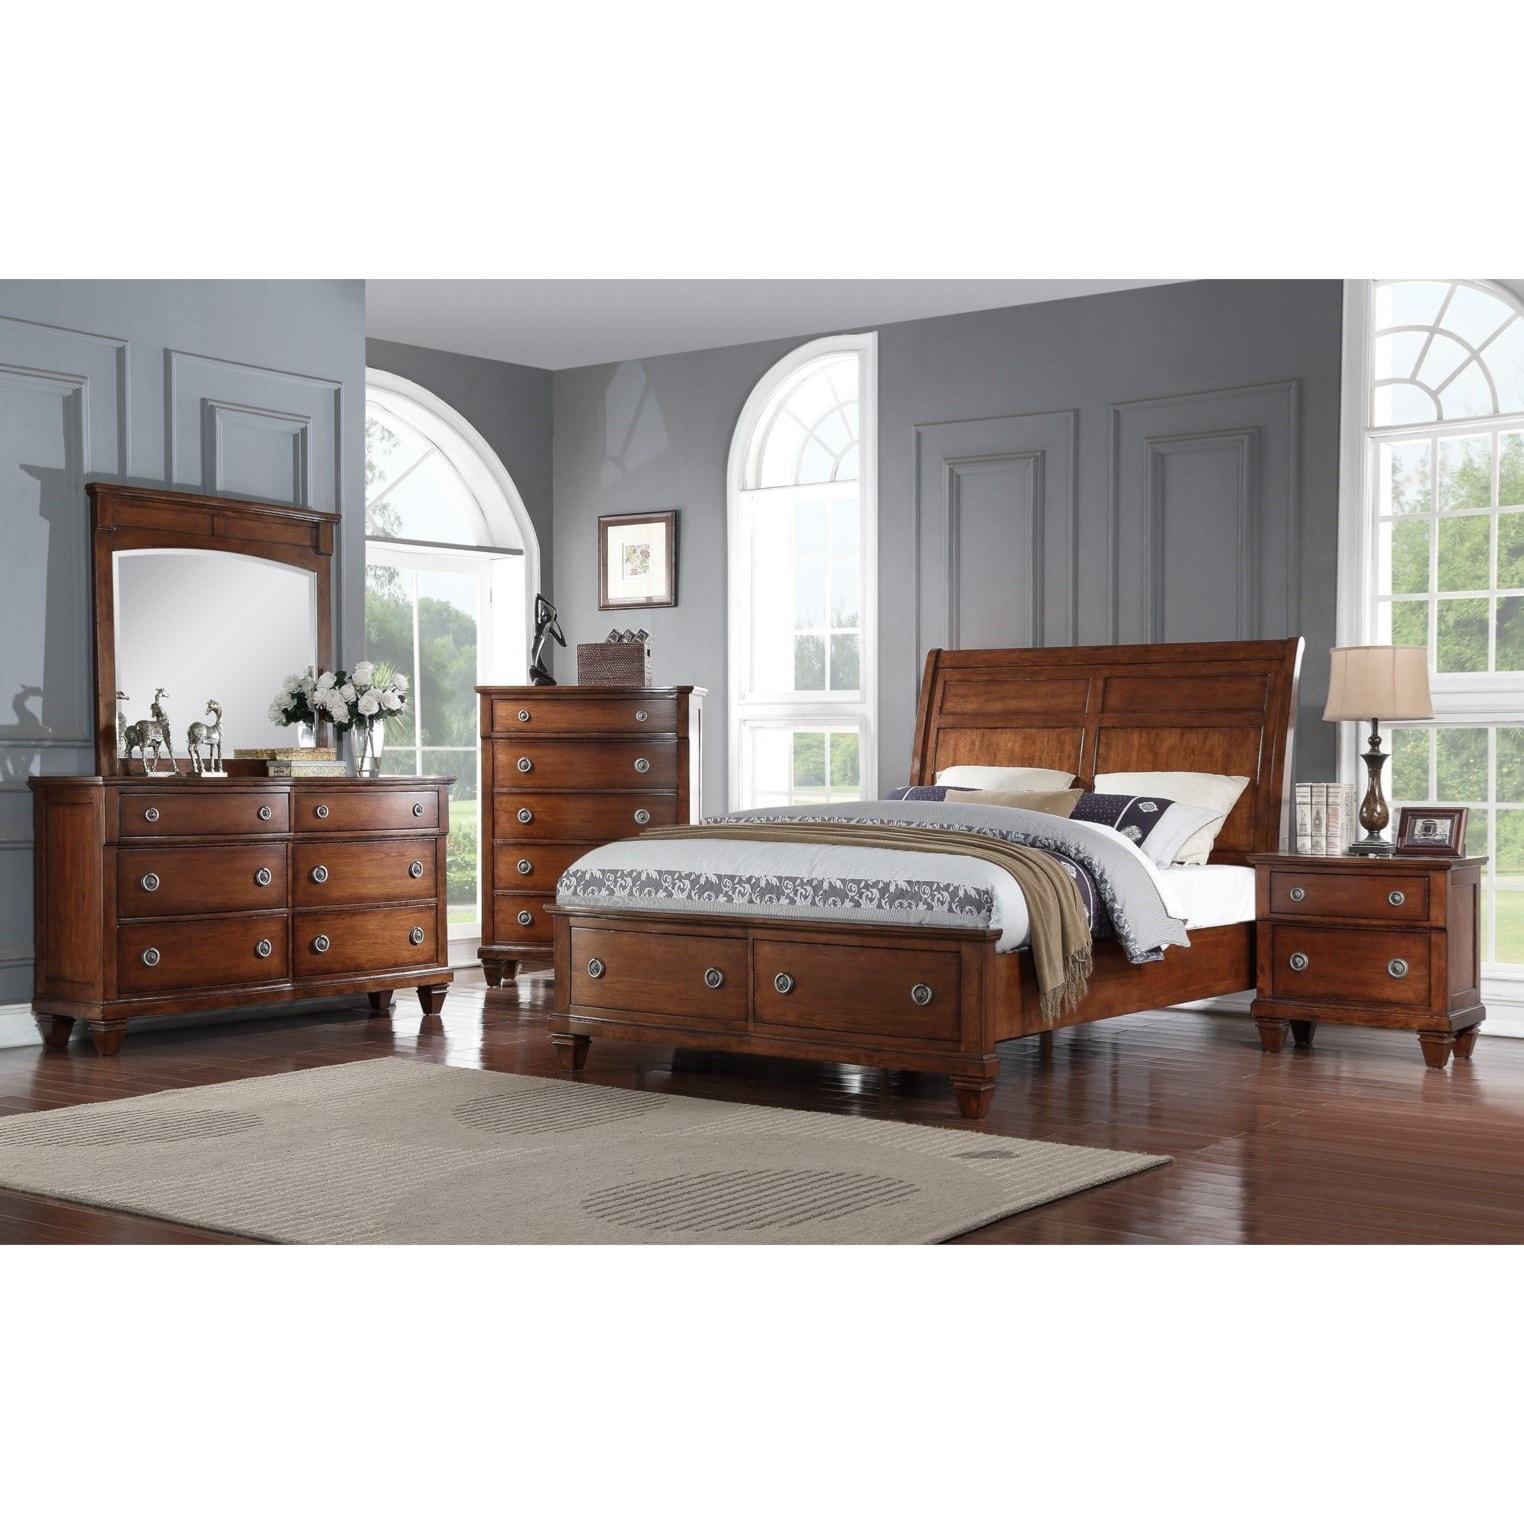 Avalon Furniture B068 Queen Bedroom Group Pilgrim